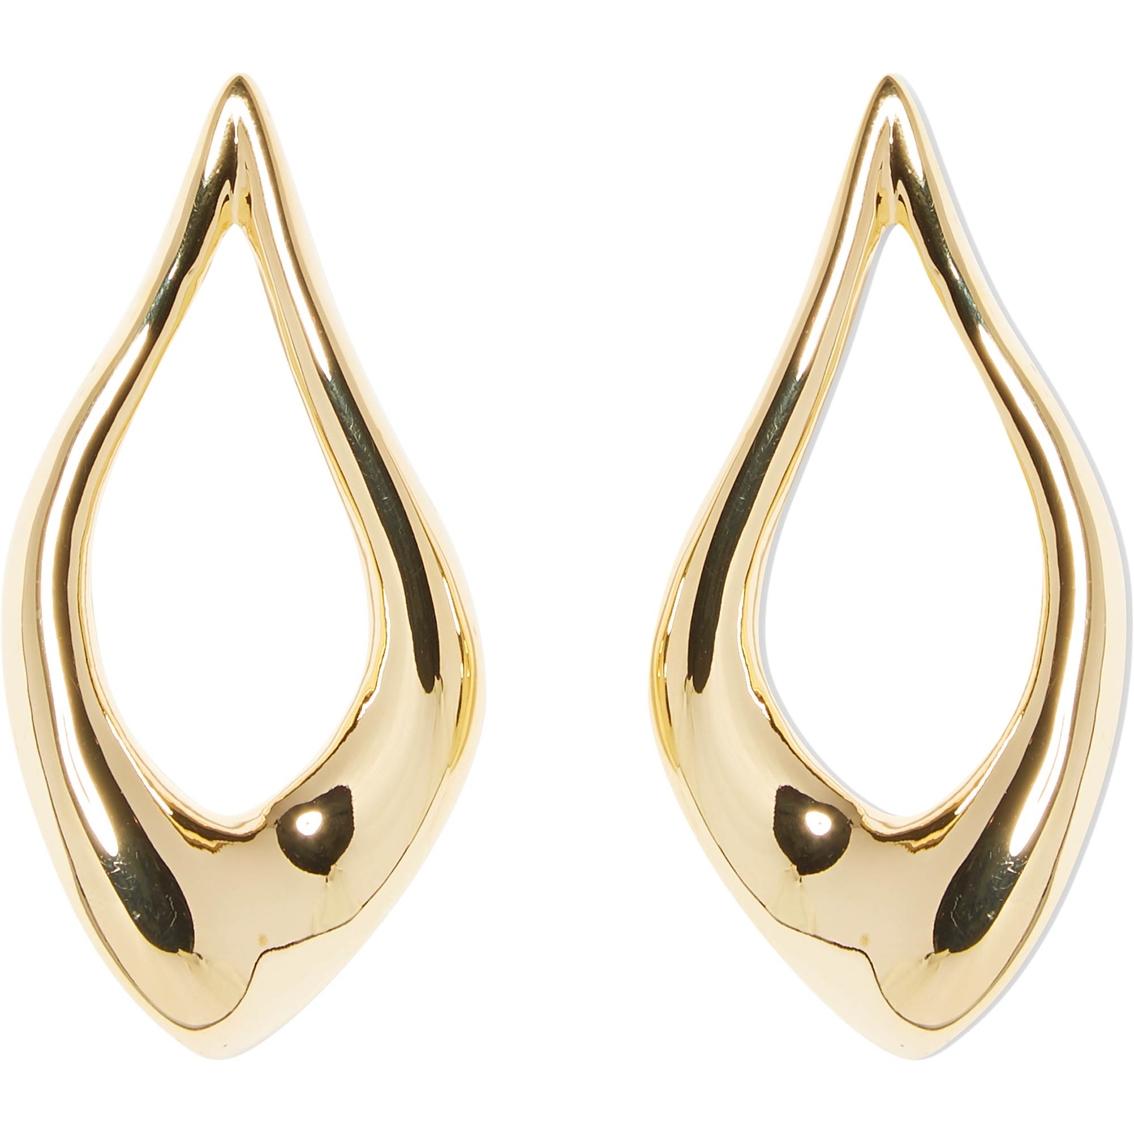 eaa3913ec62 Vince Camuto Goldtone Organic Shaped Polished Metal Post Earrings ...